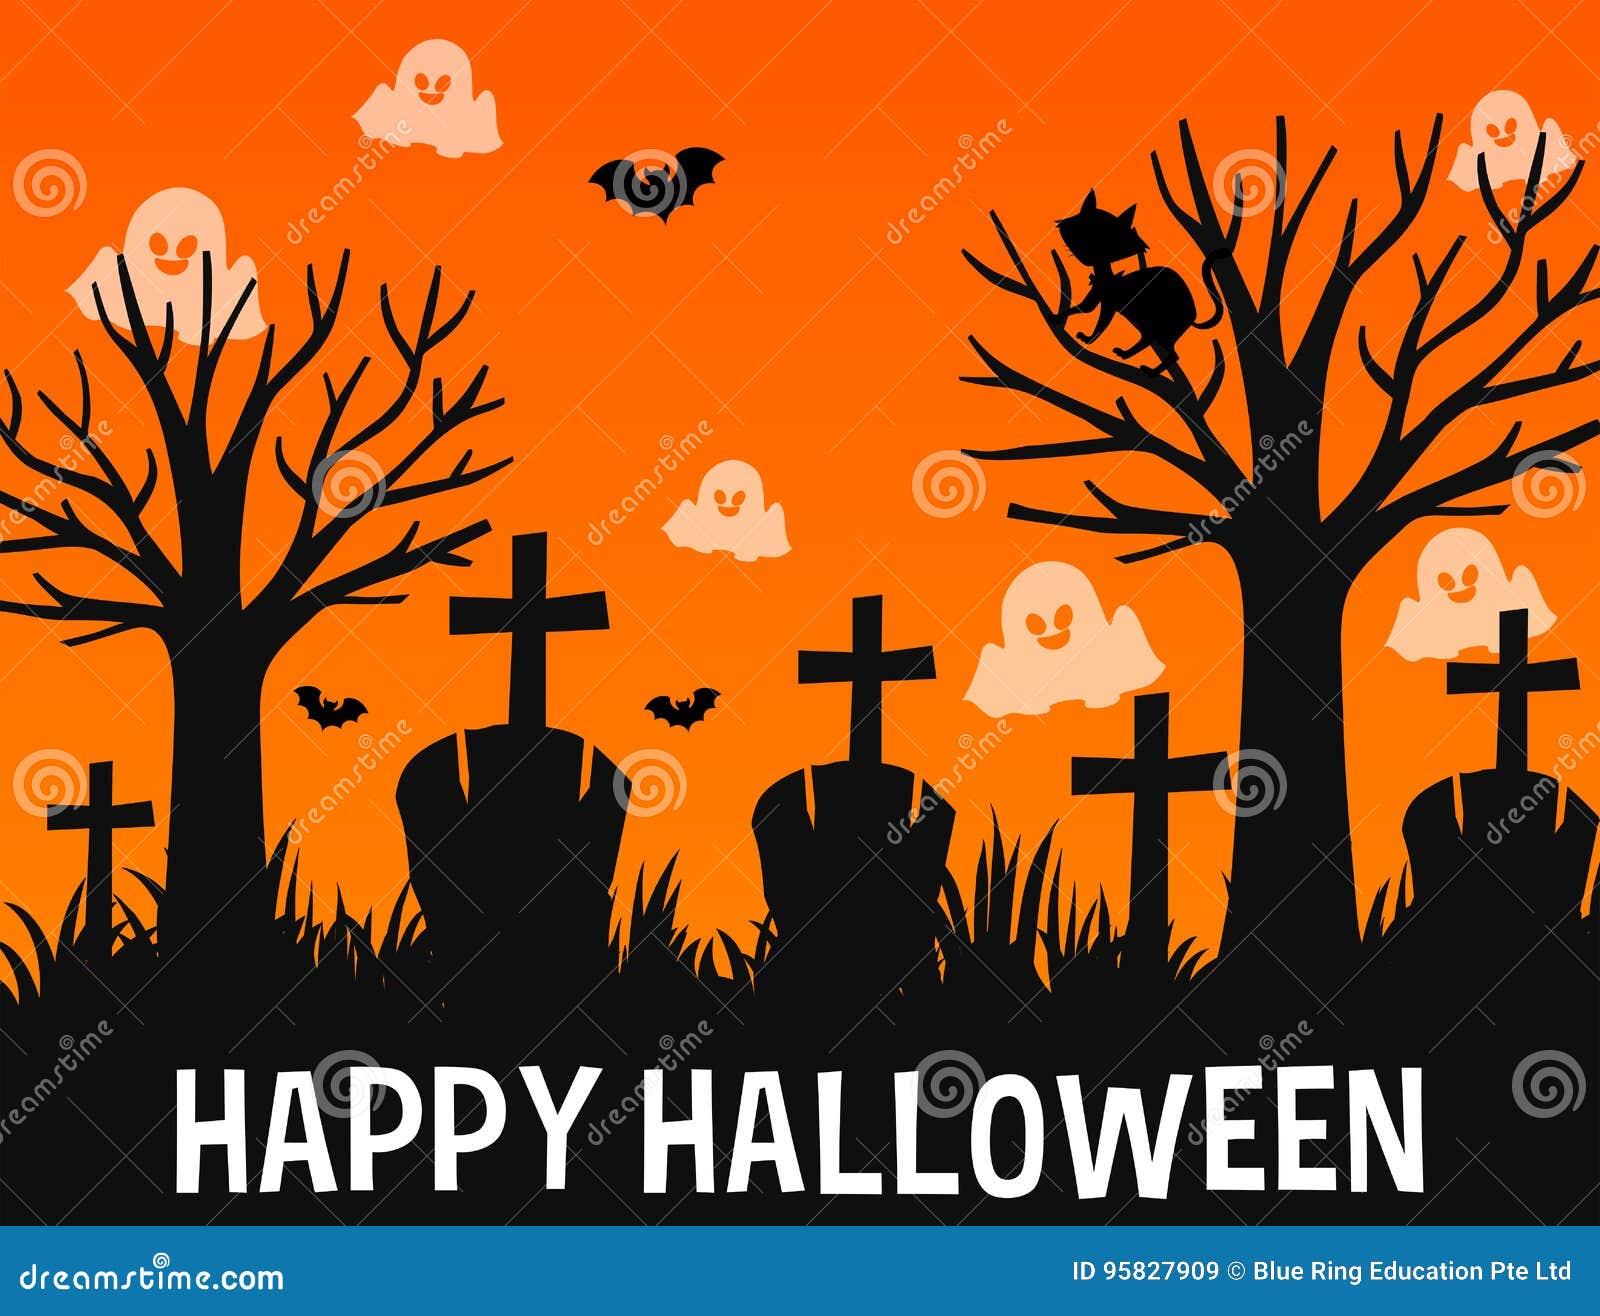 Dessin Cimetière Halloween